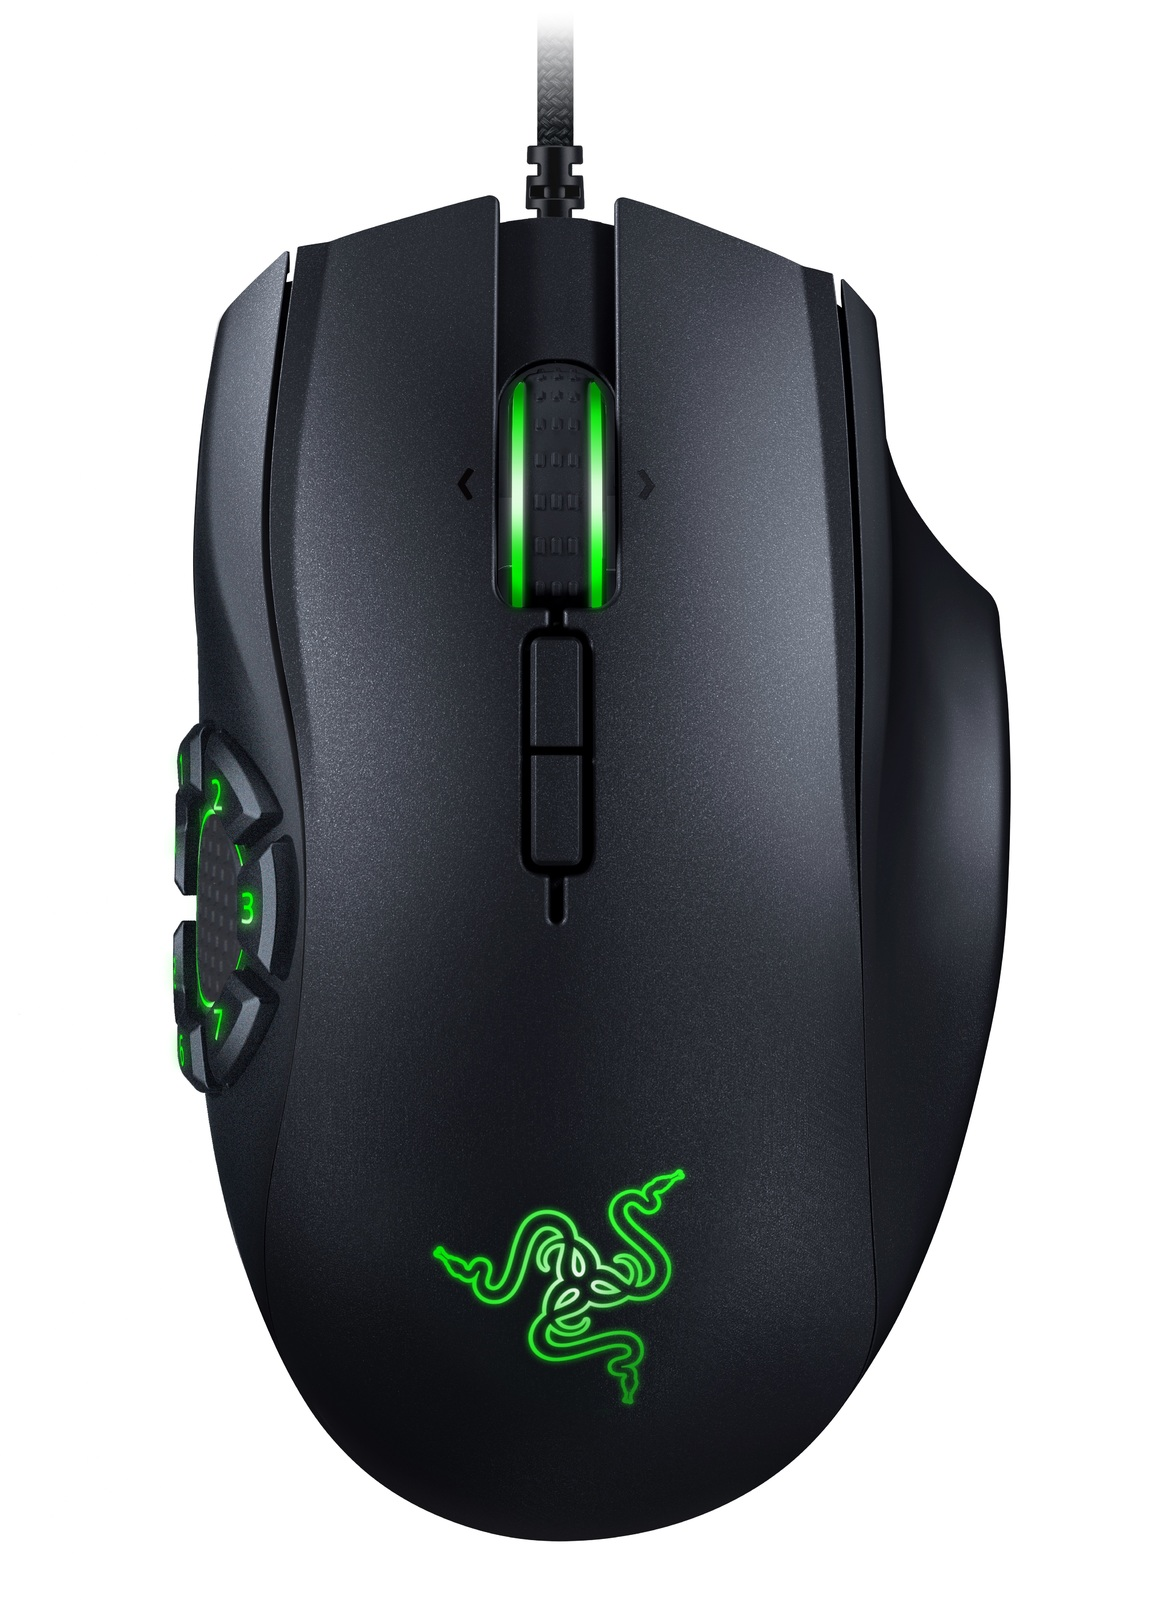 Razer Naga Hex V2 Gaming Mouse for PC Games image